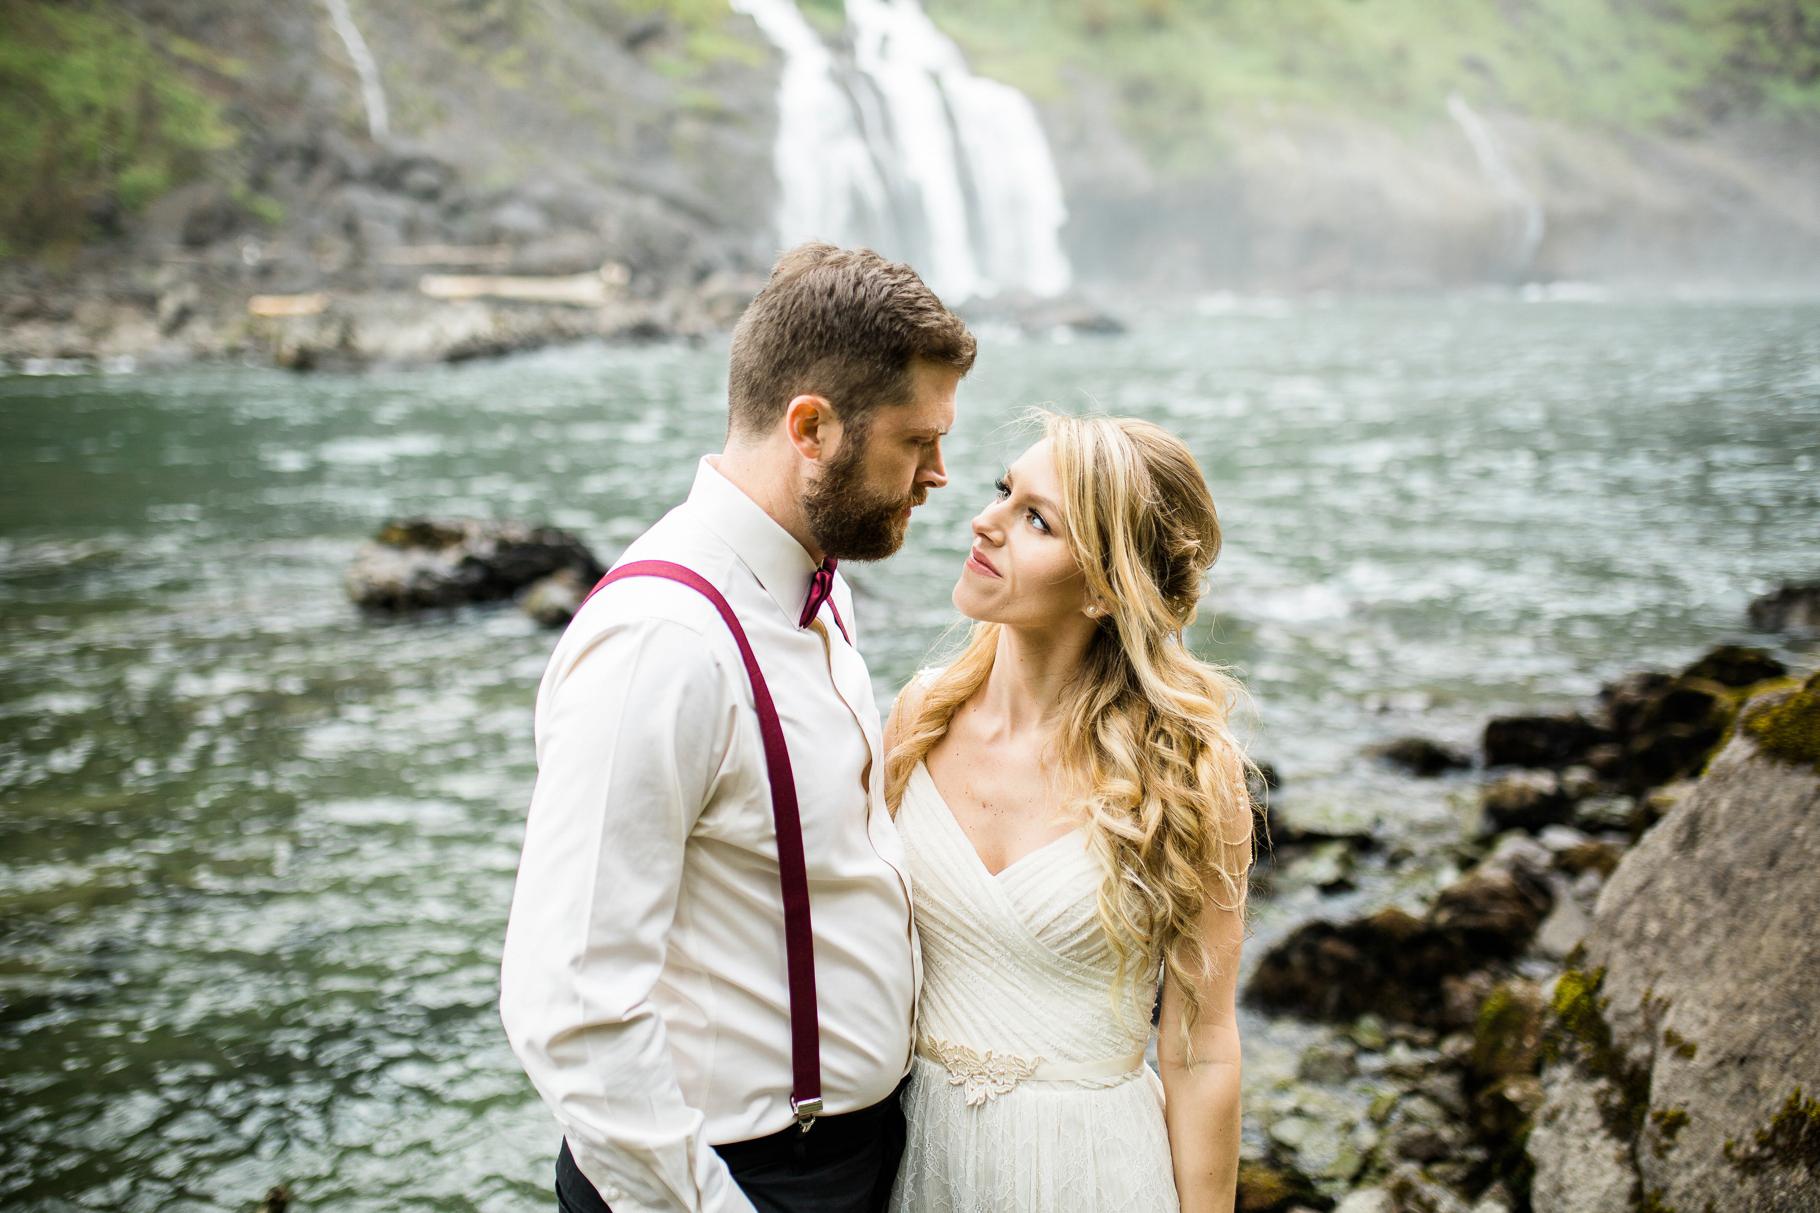 27-Adventure-Elopement-Waterfall-Seattle-Wedding-Photographer-Snoqualmie-Falls-Hike